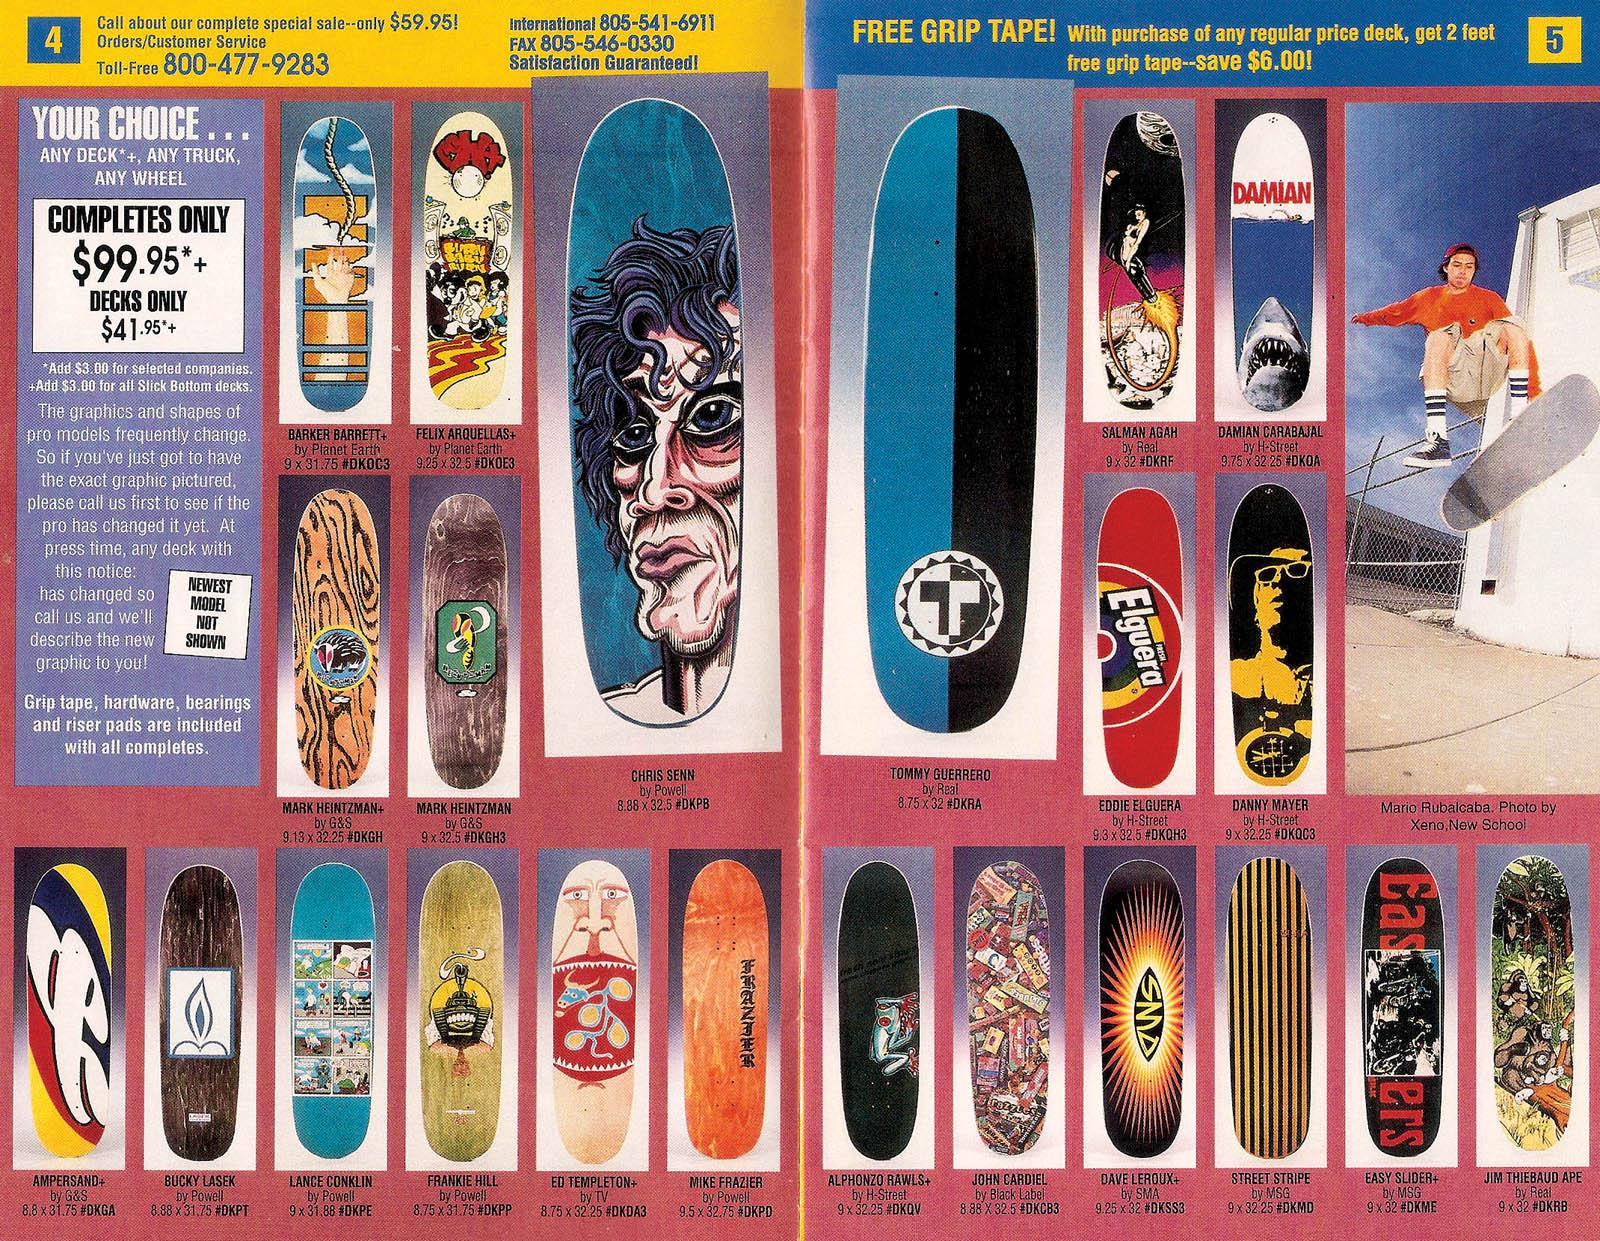 Vert Is Dead California Cheap Skates 1992